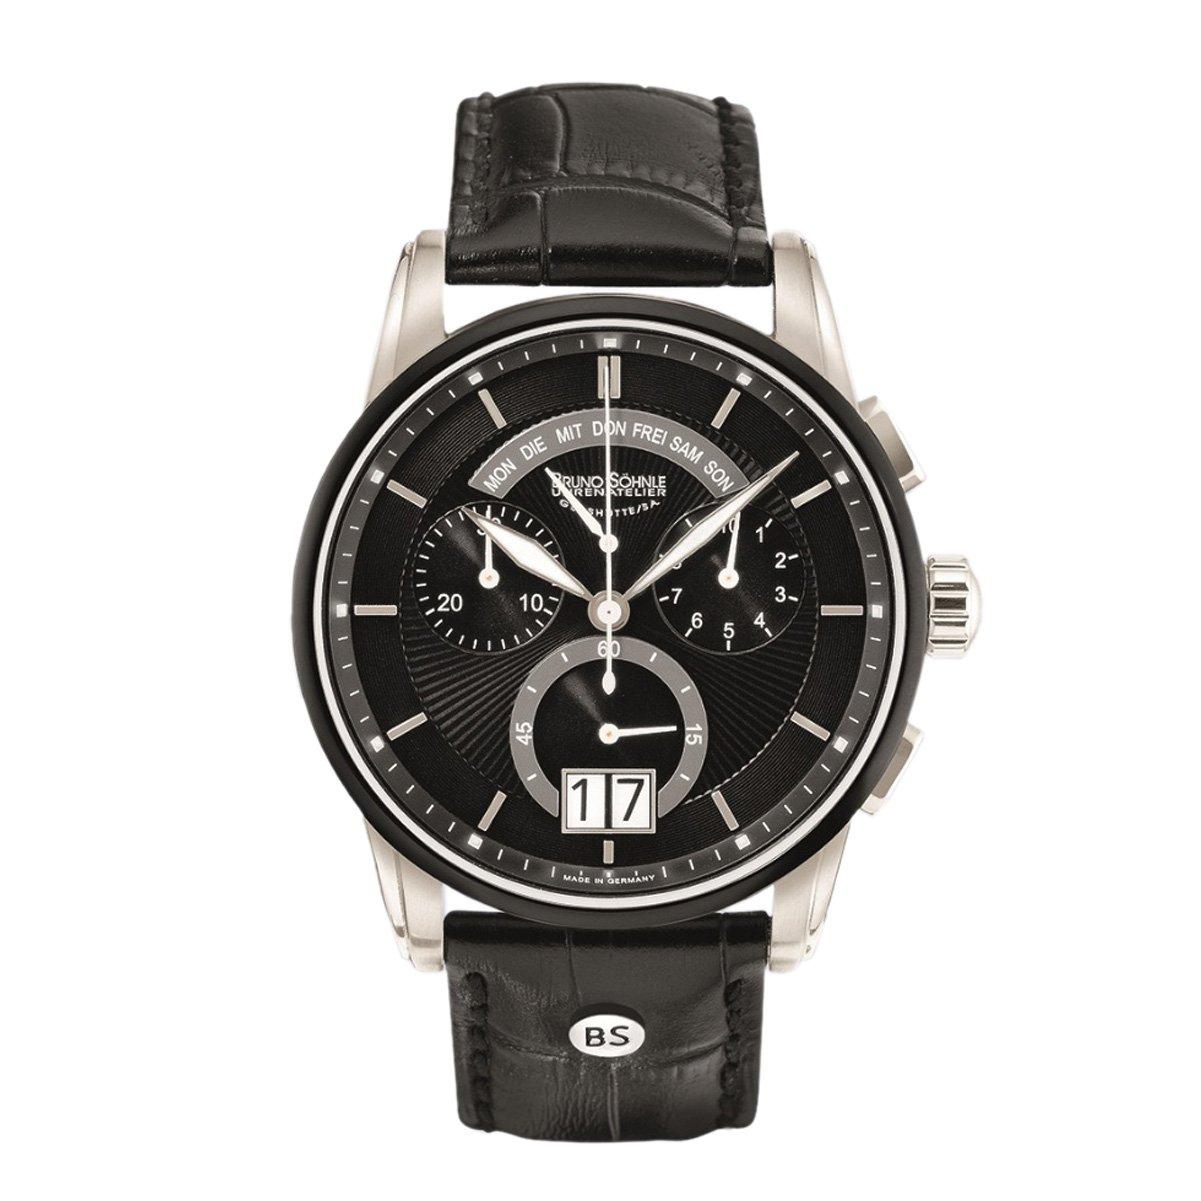 Herren-Armbanduhr XL Grandioso Chronograph Quarz Leder 17-73117-741